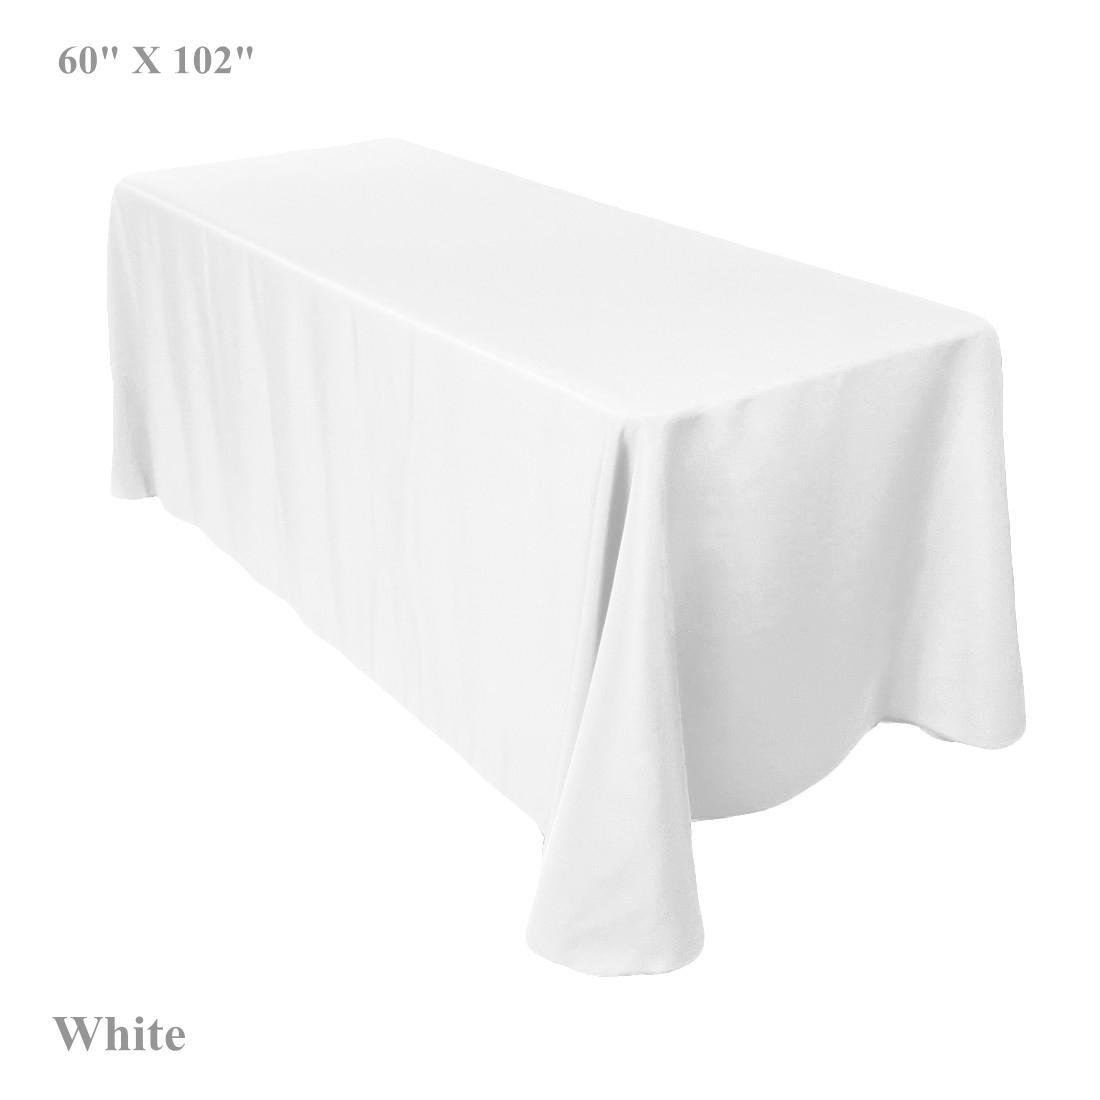 Good Table Cover White Ivory Black 60x 102 Rectangular Polyester Tablecloth  Wedding Restaurant Banquet Party Banquet Tablecloths Tablecloth Fabric From  ...